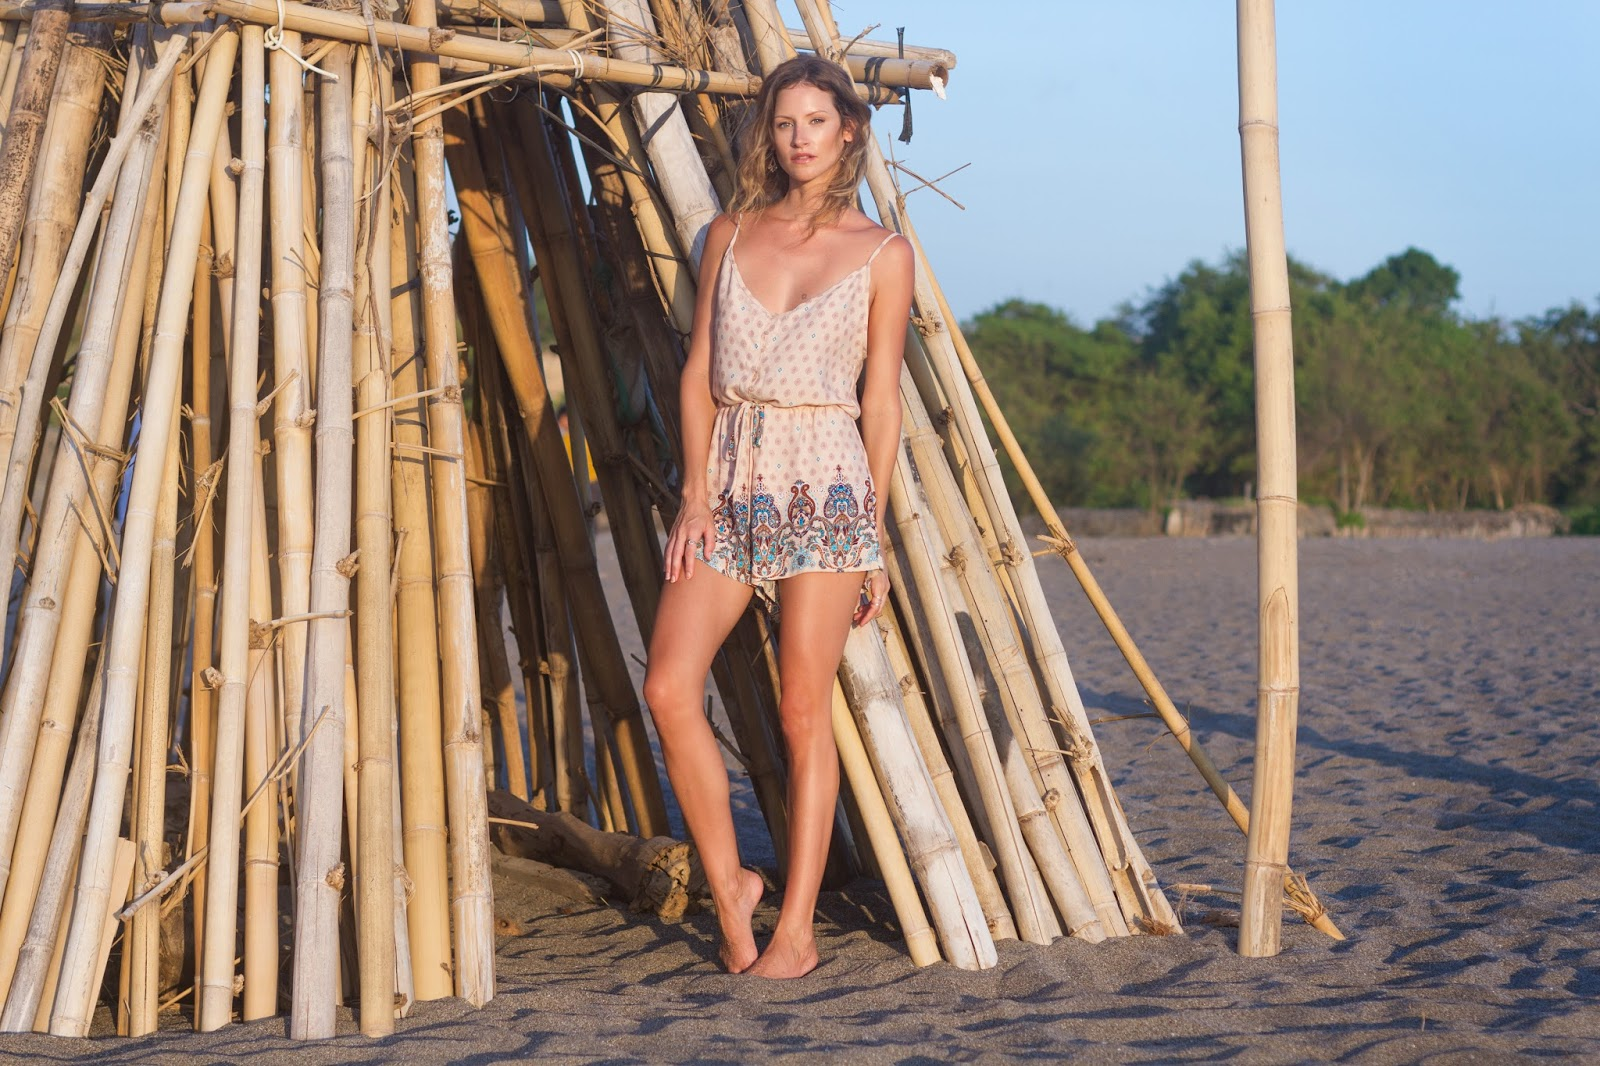 fashion blogger and designer, Alison Hutchinson, is wearing a KAYVALYA Ruko Romper in Bali, Indonesia